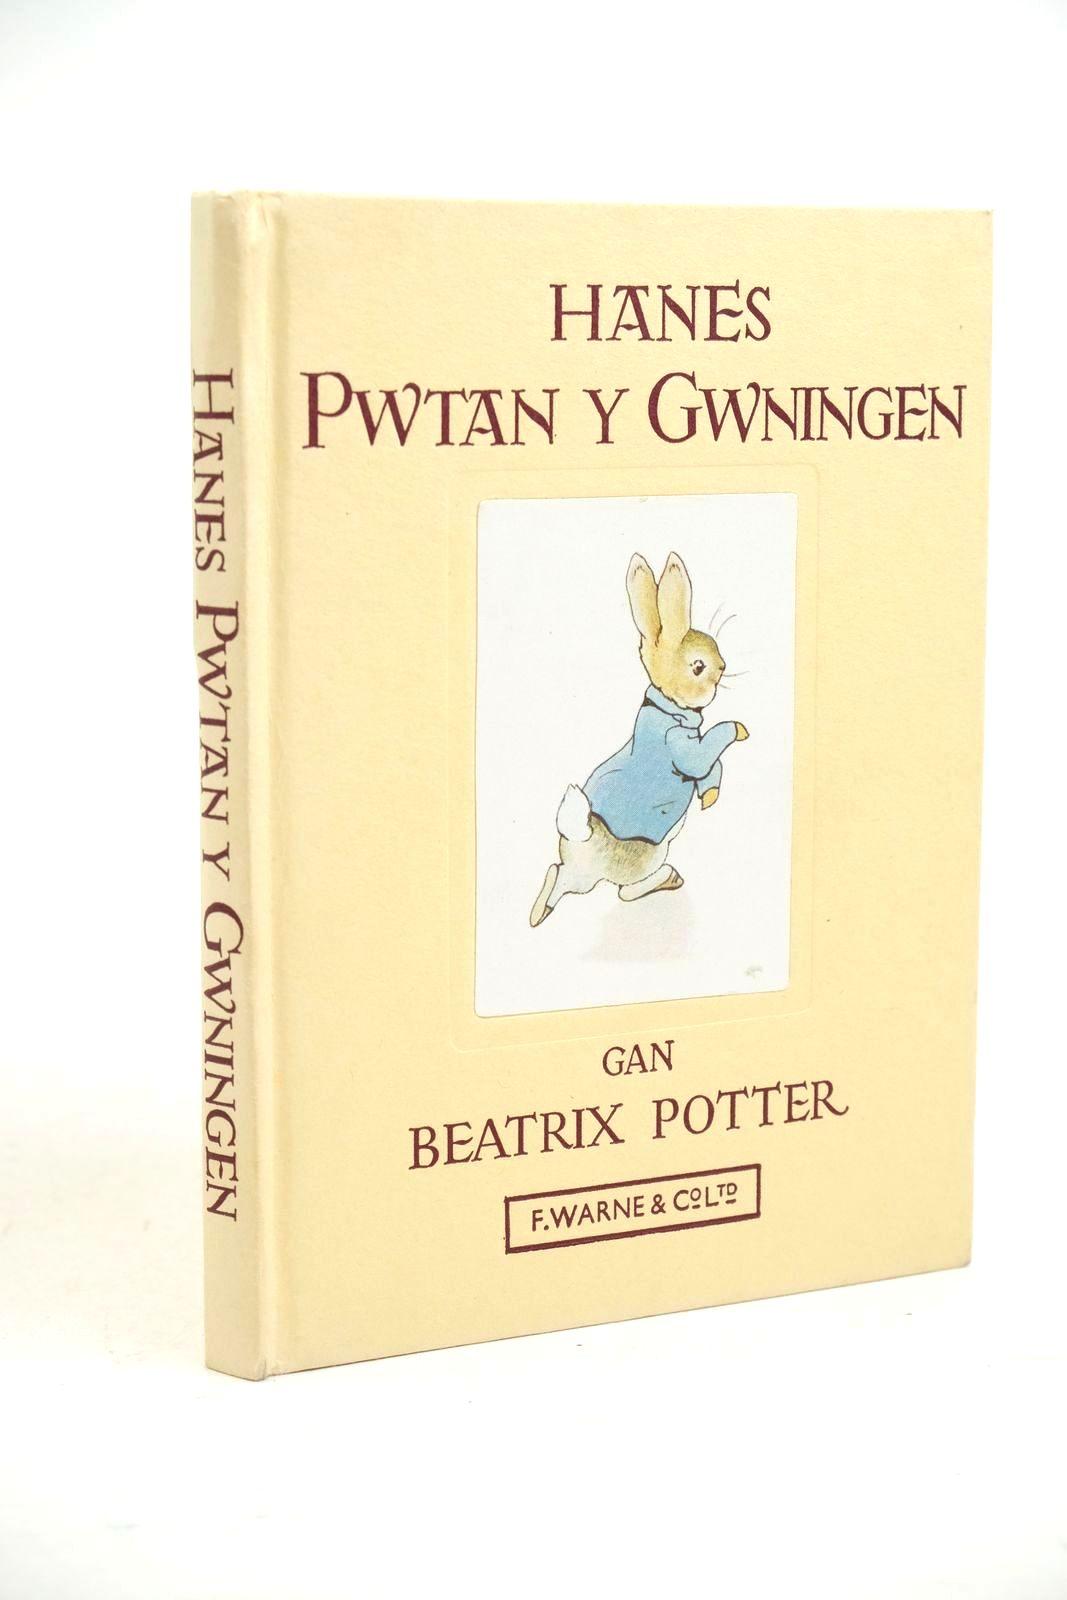 Photo of HANES PWTAN Y GWNINGEN- Stock Number: 1321170